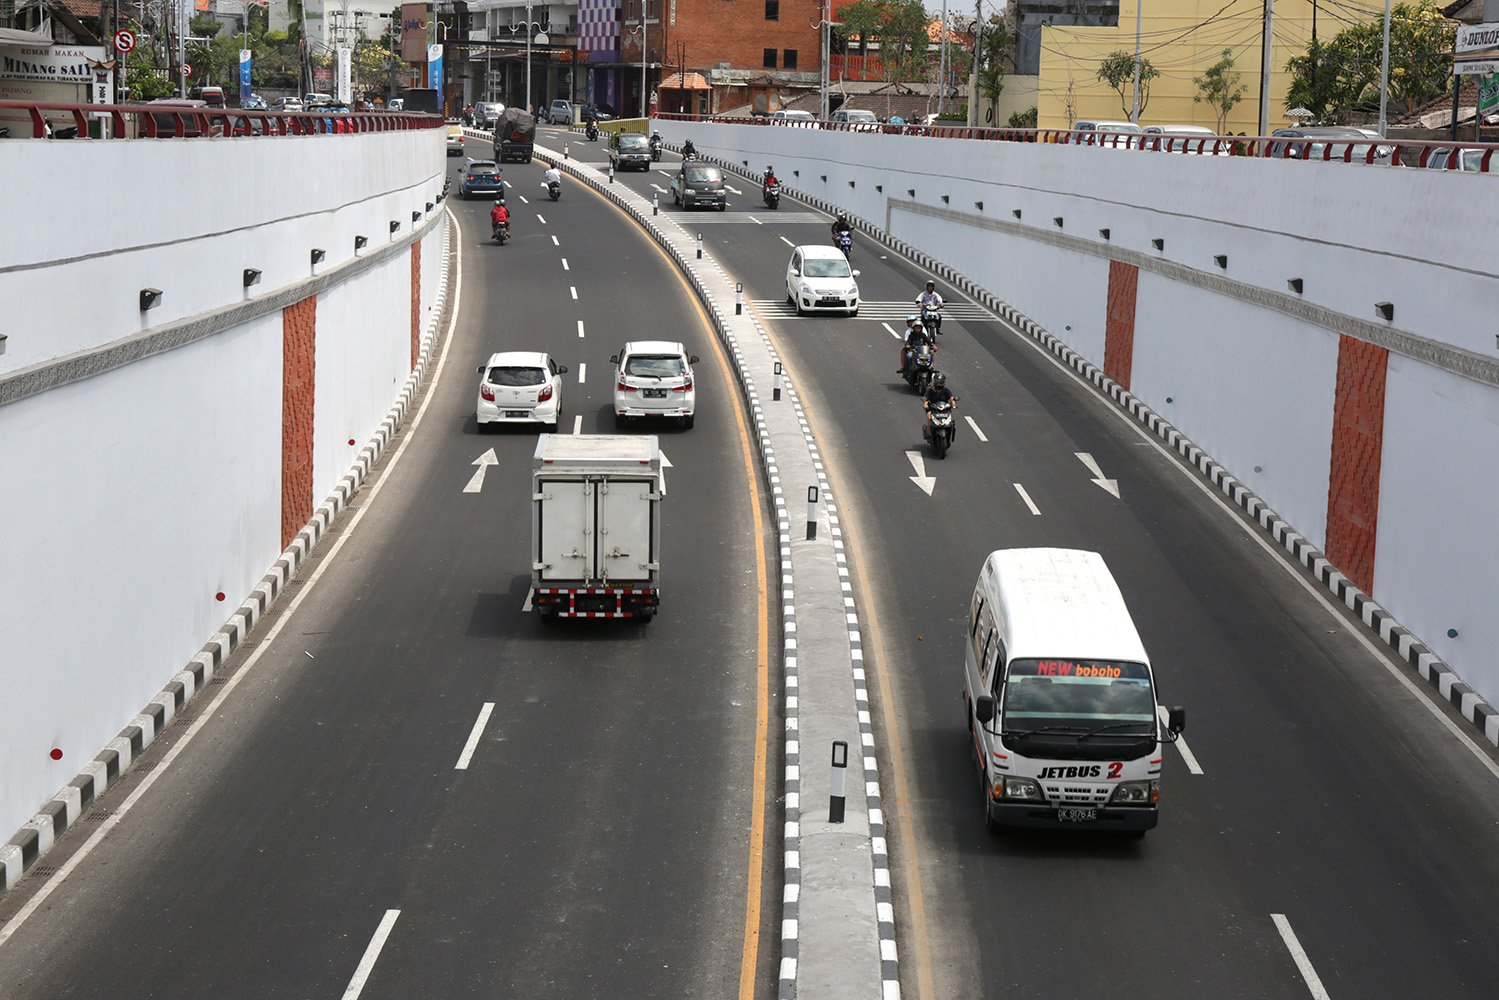 Suasana underpass Simpang Tugu Ngurah Rai Bali (14/10). Underpass tersebut dibangun untuk memperlancar lalu lintas khususnya menyambut perhelatan akbar pertemuan tahunan Dana Moneter Internasional (IMF) dan Bank Dunia, 8-14 Oktover 2018.